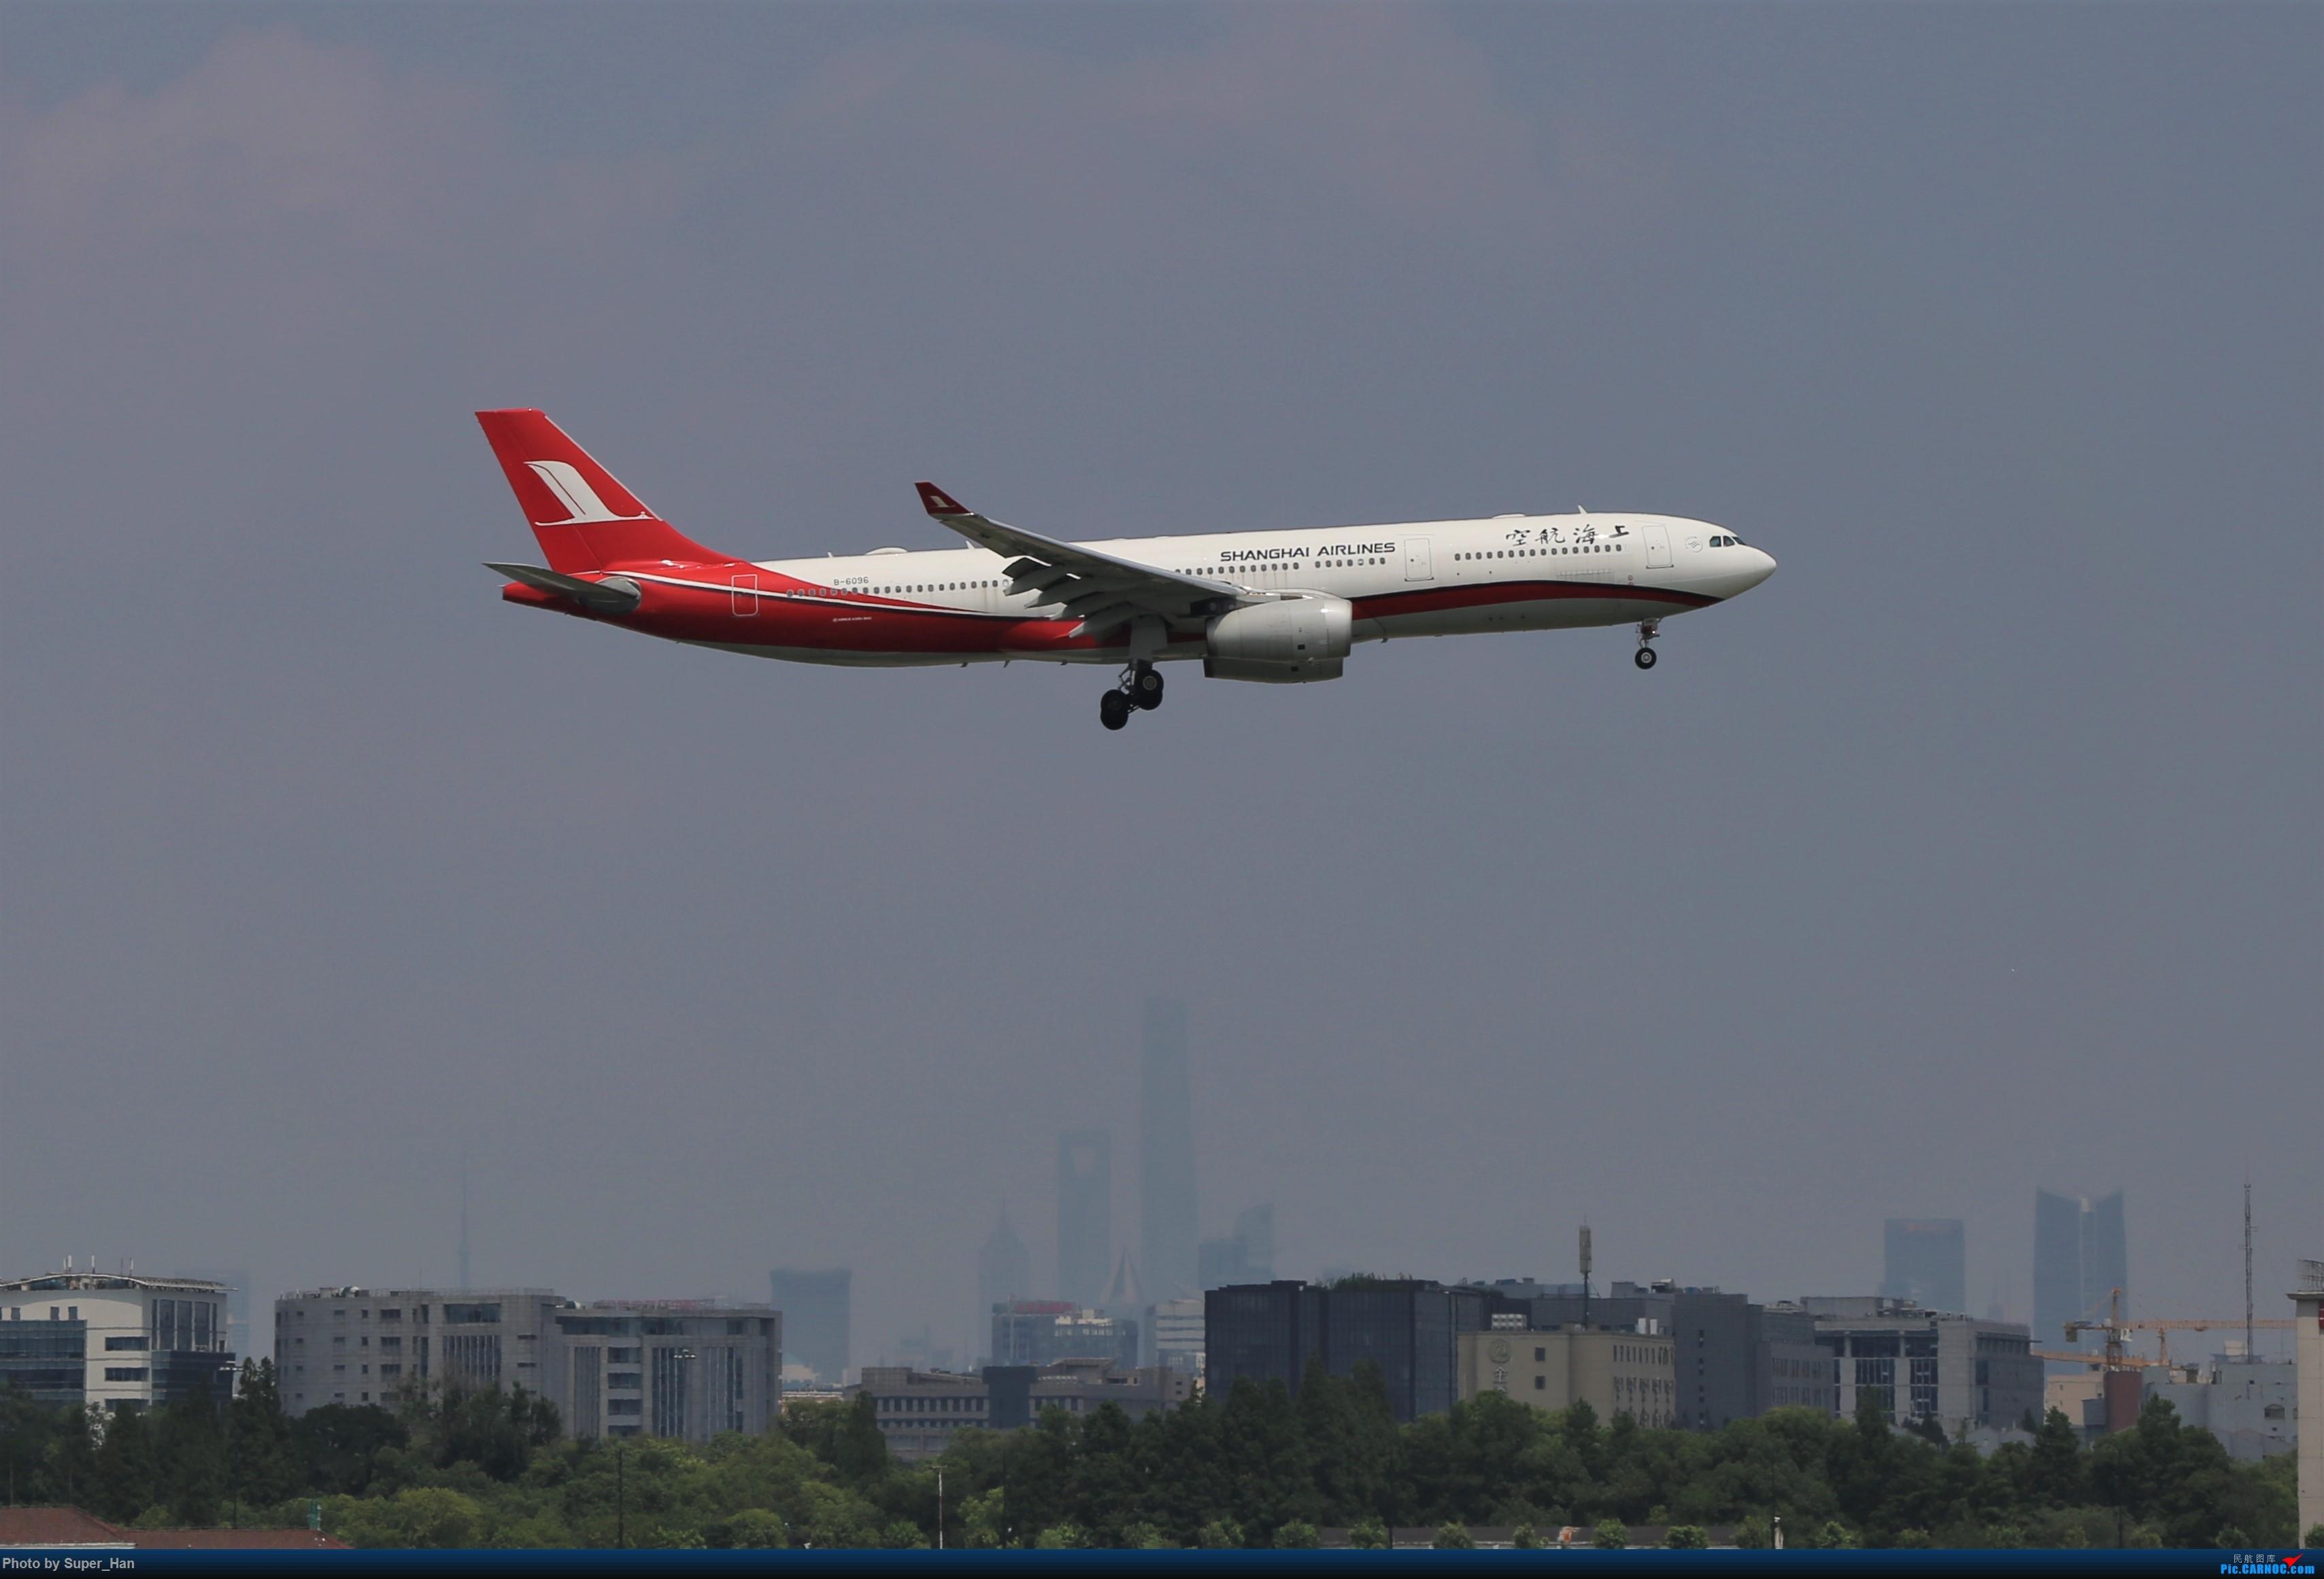 Re:[原创]【杭州飞友会】浦东之上 AIRBUS A330-300 B-6096 中国上海虹桥国际机场